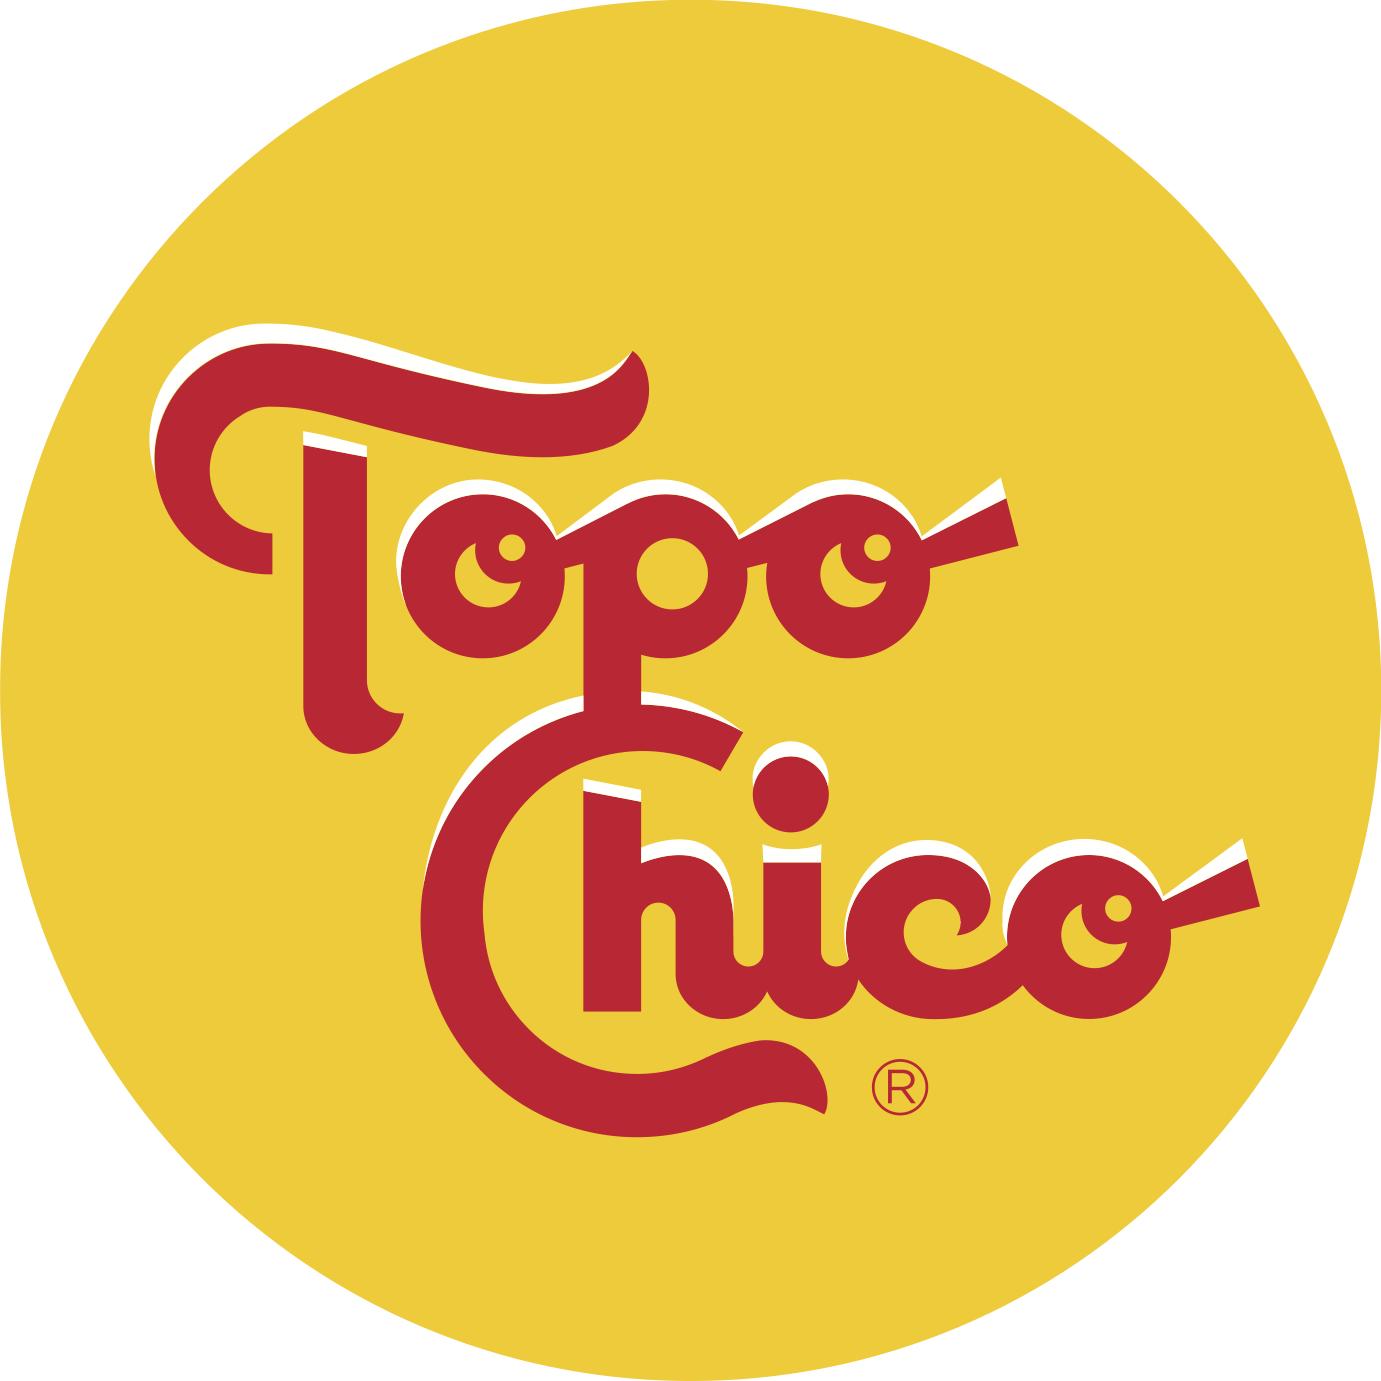 TopoChico-soundscapestudios.png